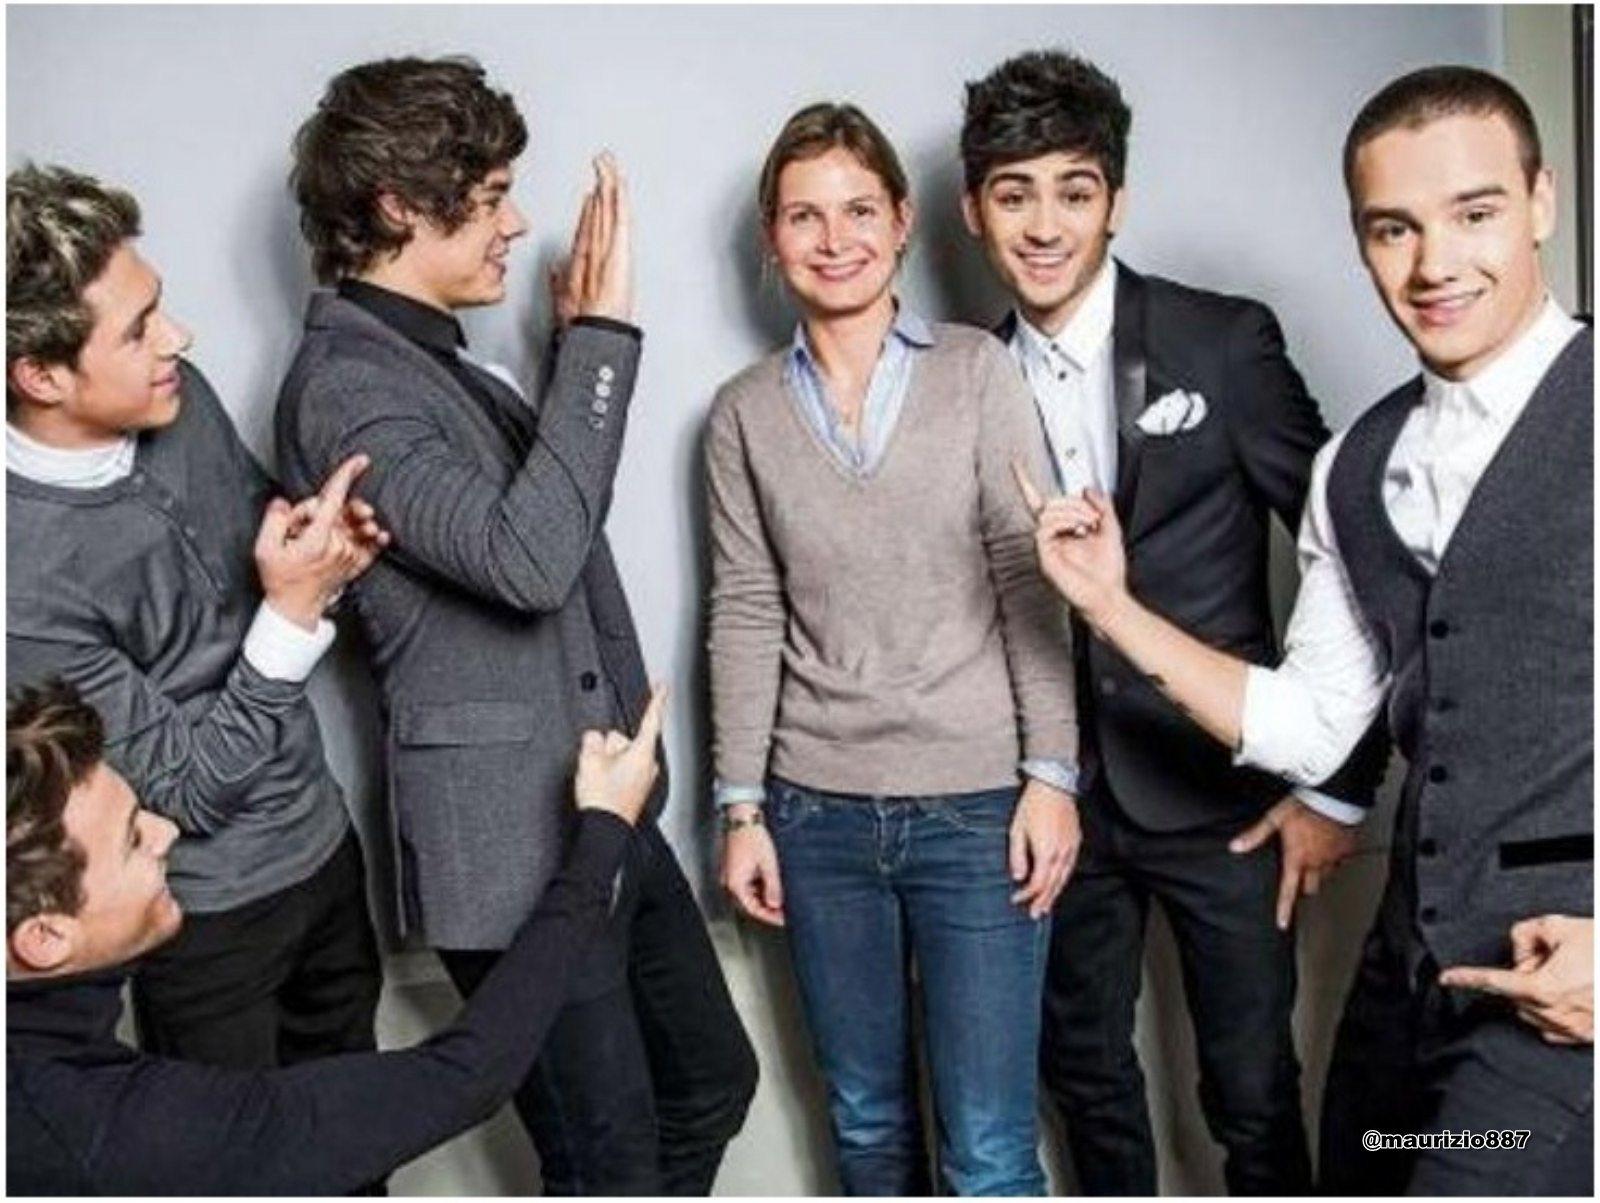 One Direction One Direction photoshoots Dusseldorf